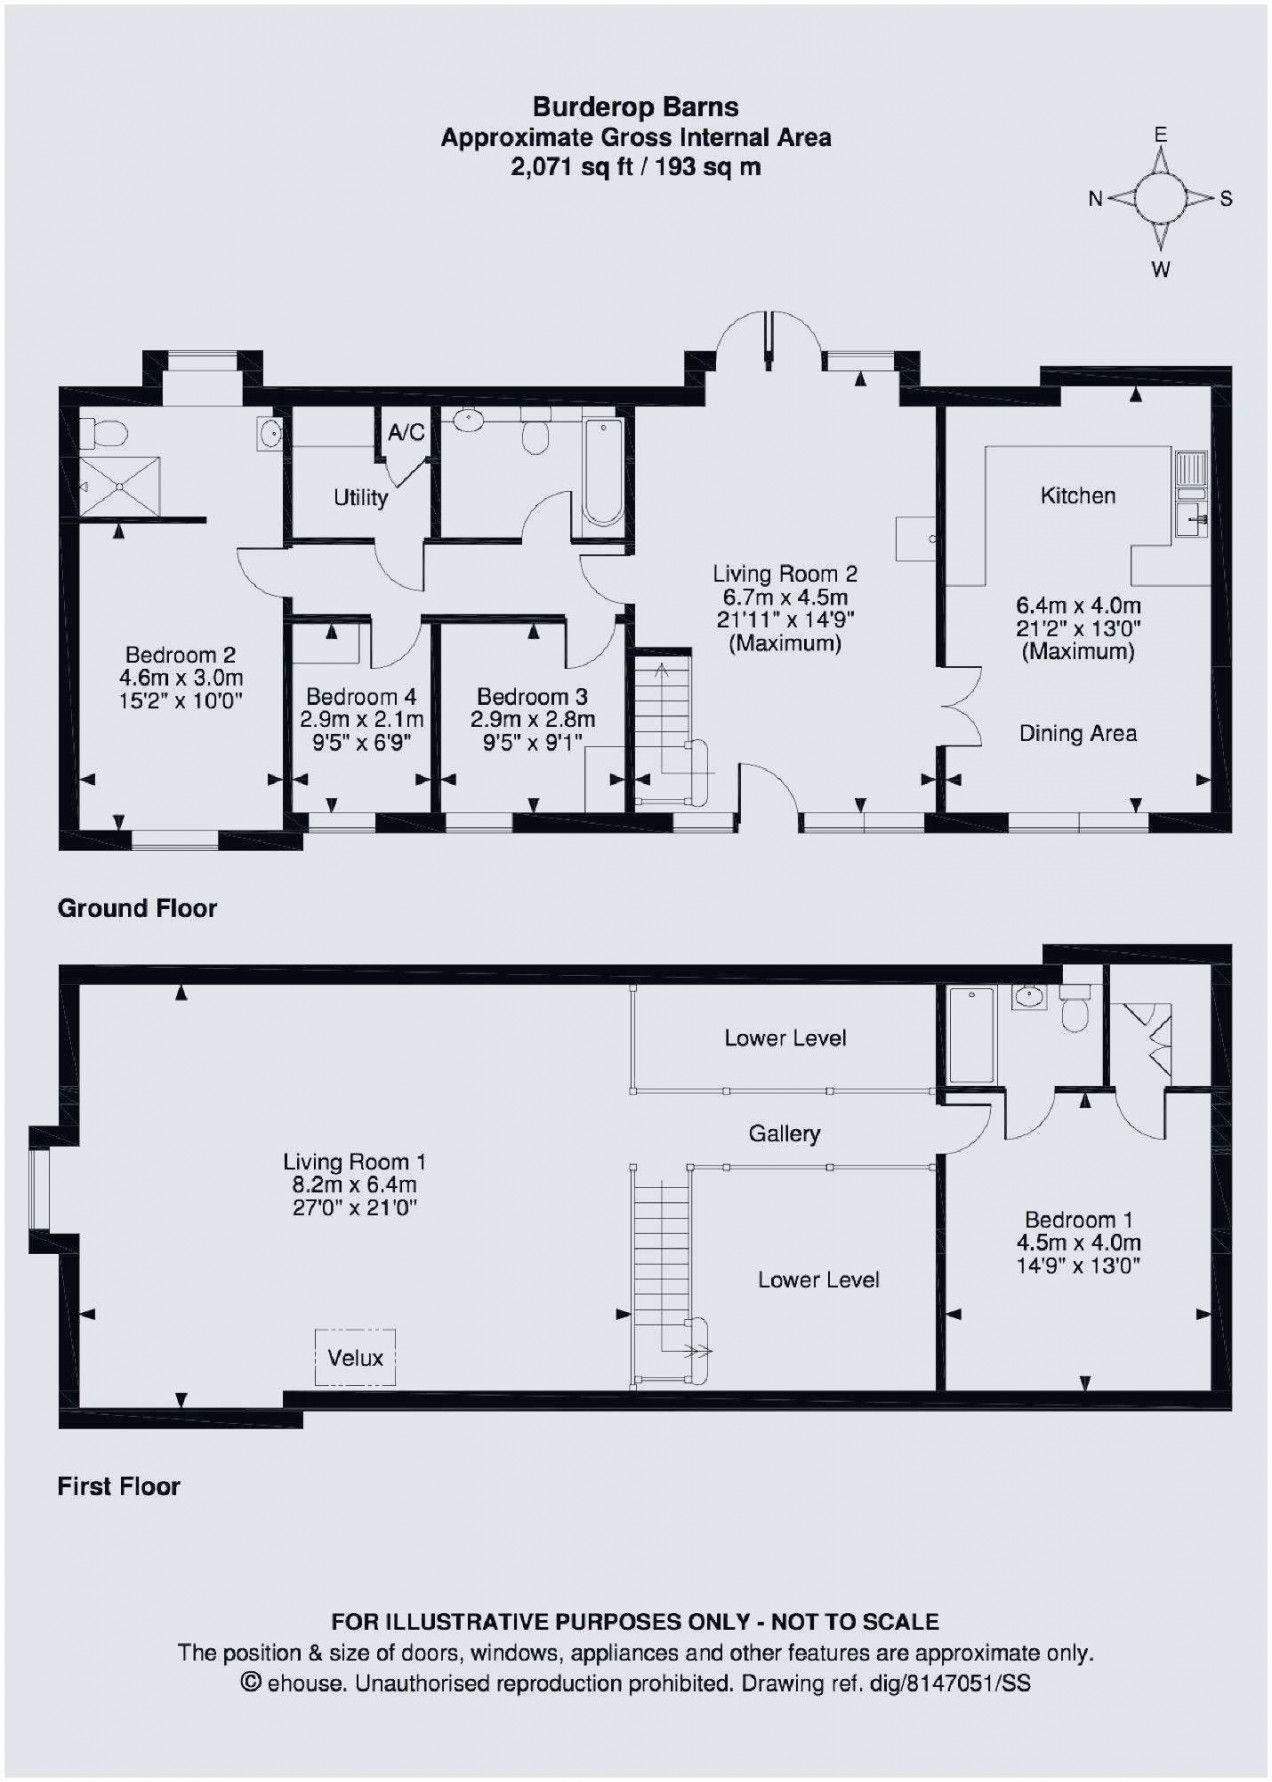 Simple House Lovely Simple Barn House Plans Home Design Barndominium Floor Plans Cabin House Plans Loft Floor Plans